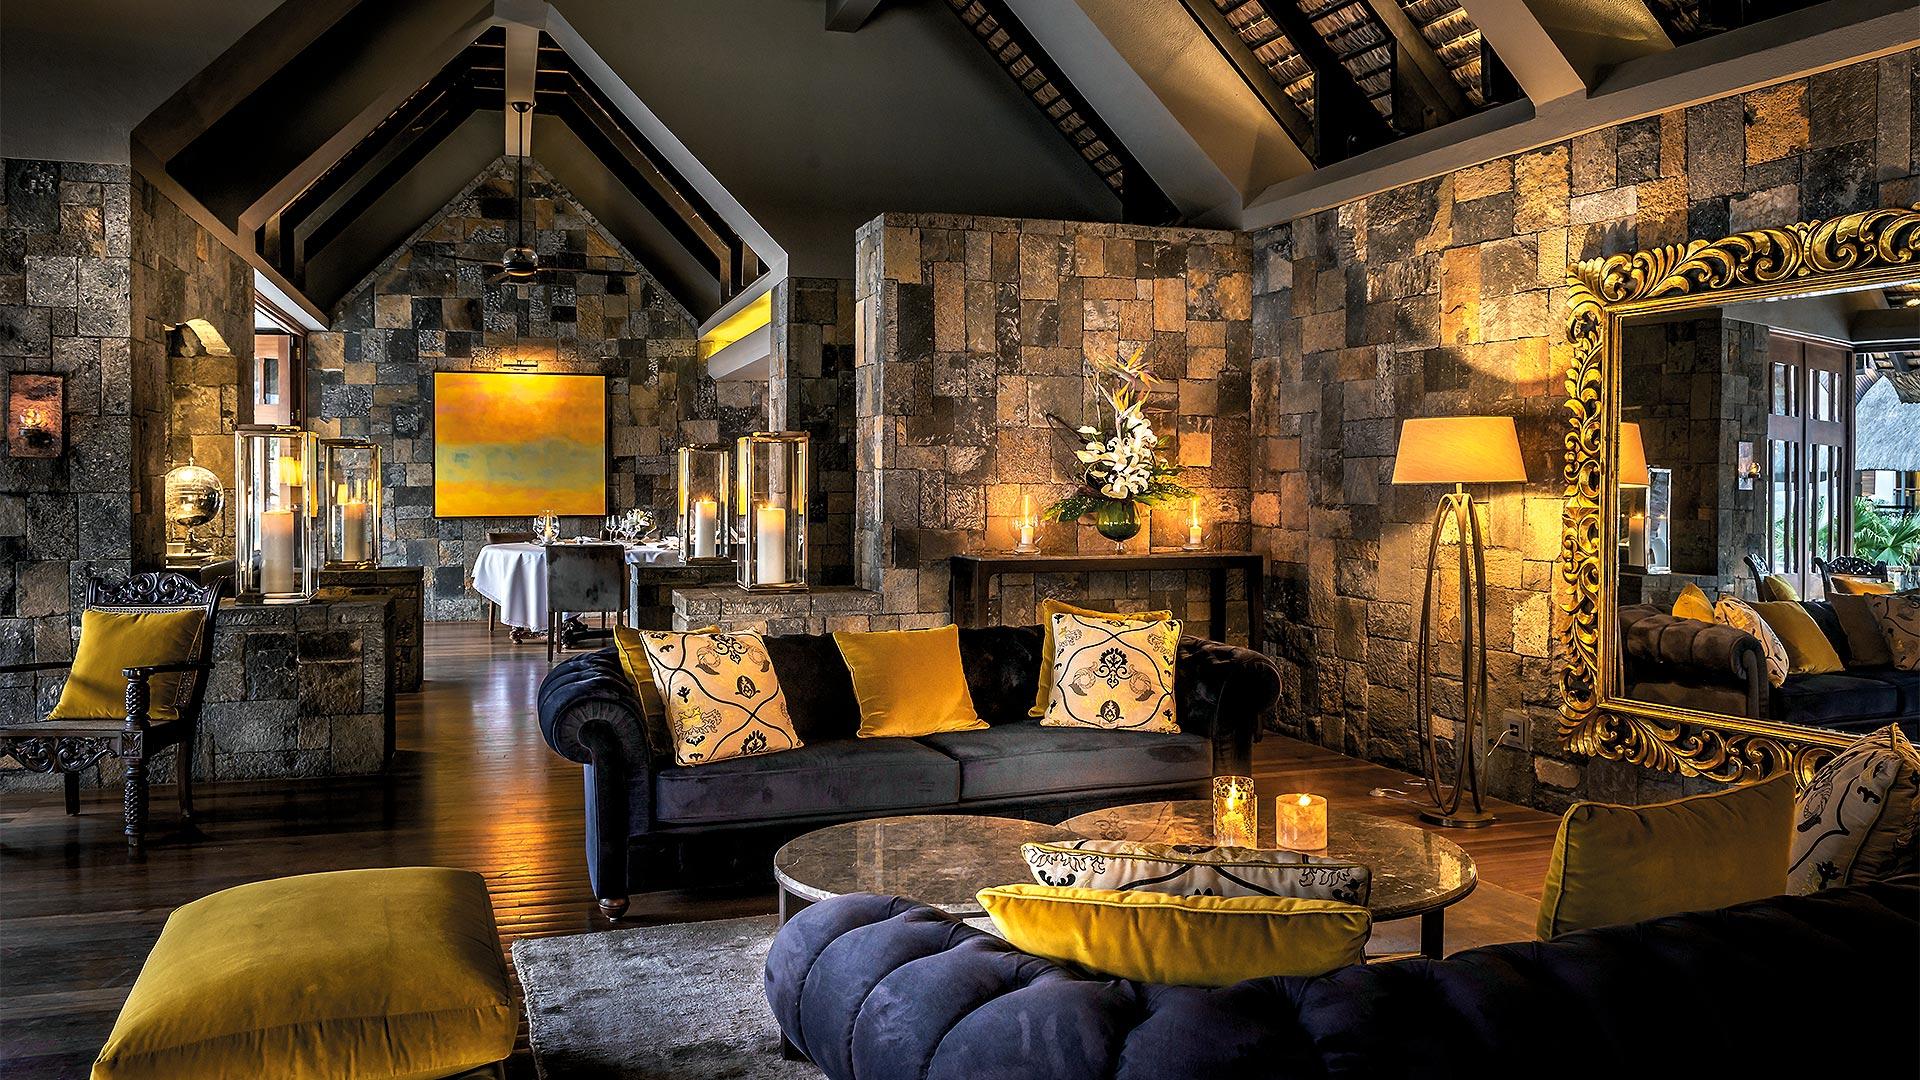 La Table du Capitaine - Restaurant - Dining - Luxurious - Royal Palm Mauritius